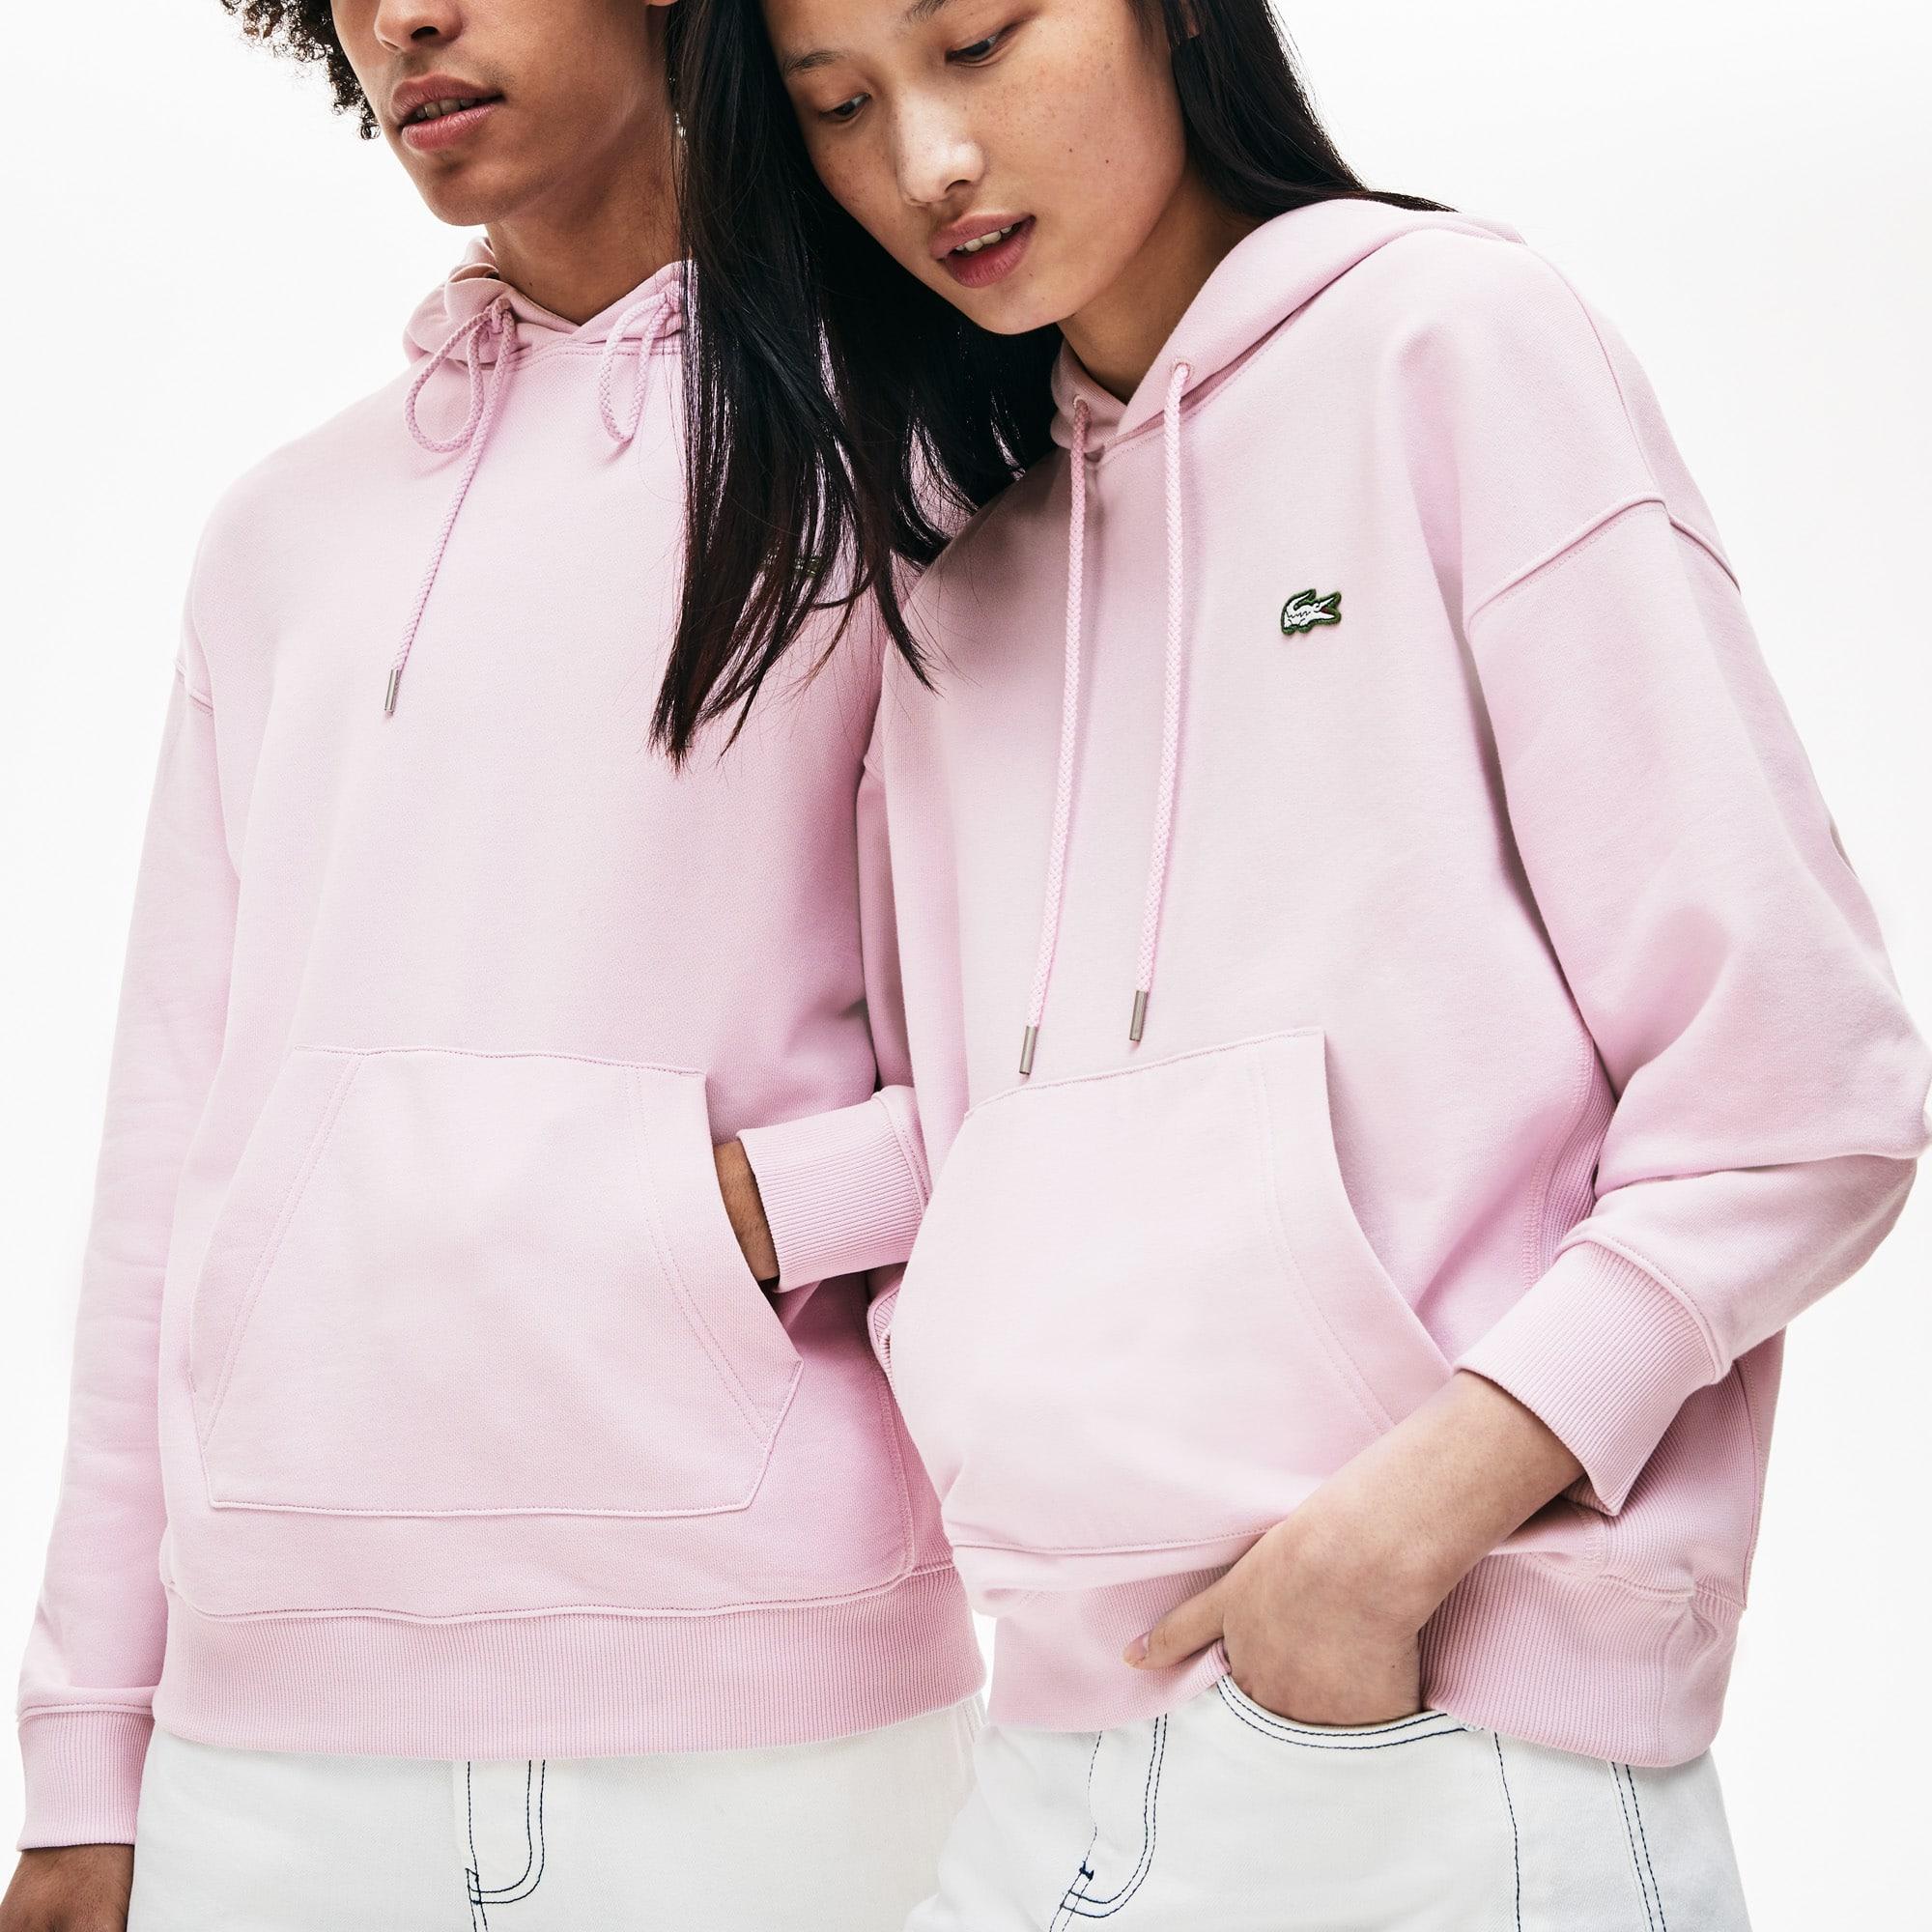 Sweatshirts Sweatshirts Pullovers amp; Lacoste amp; Homme T4FqzRT1